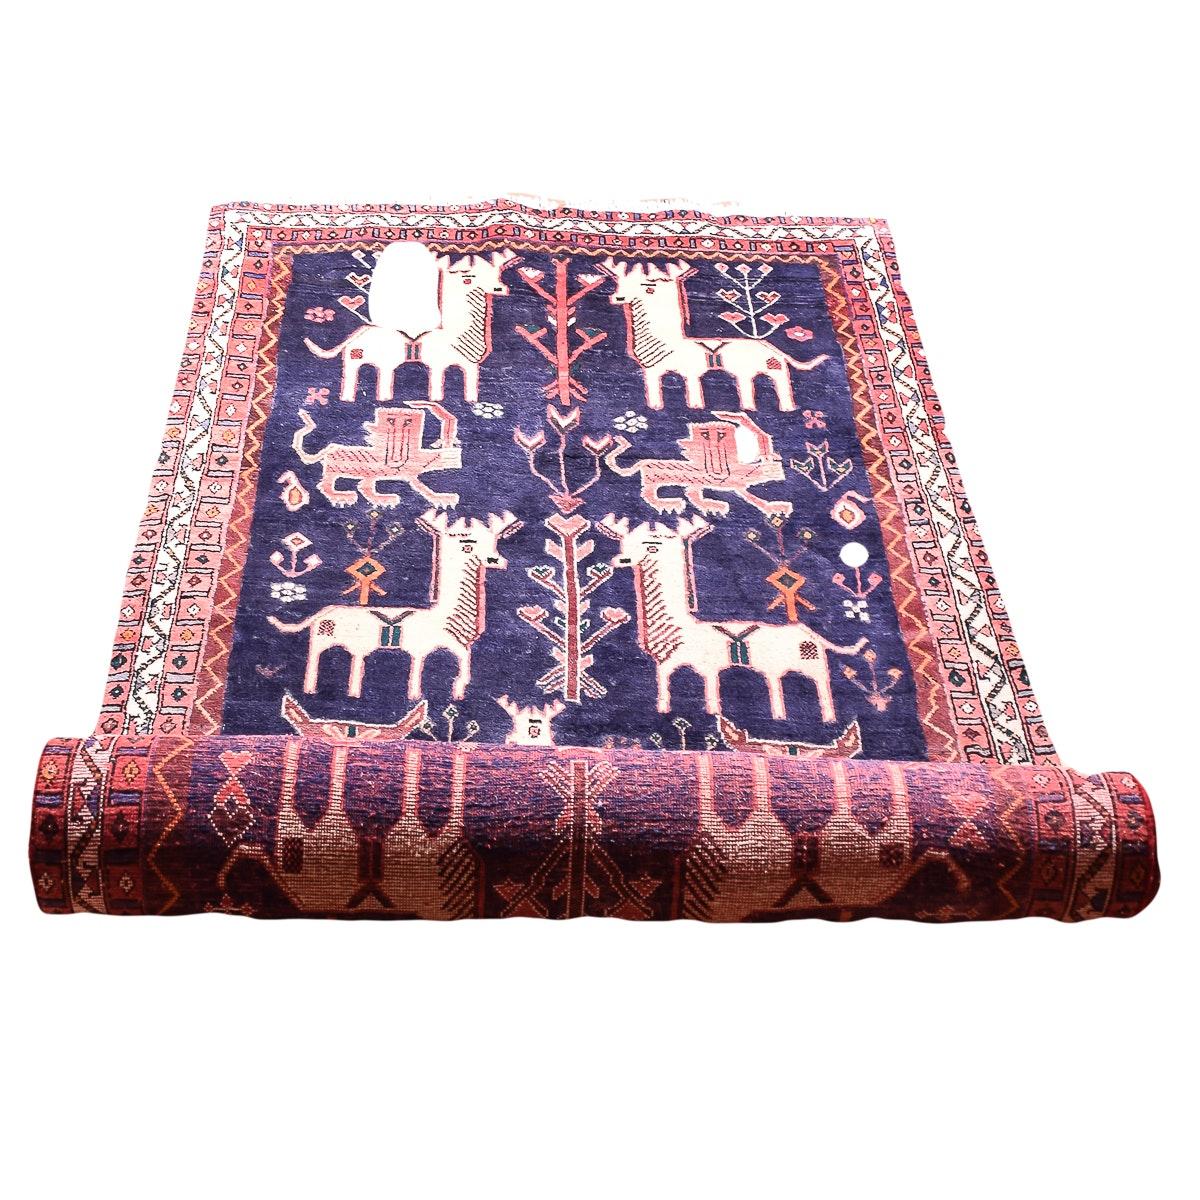 Elaborate Handwoven Persian Area Rug